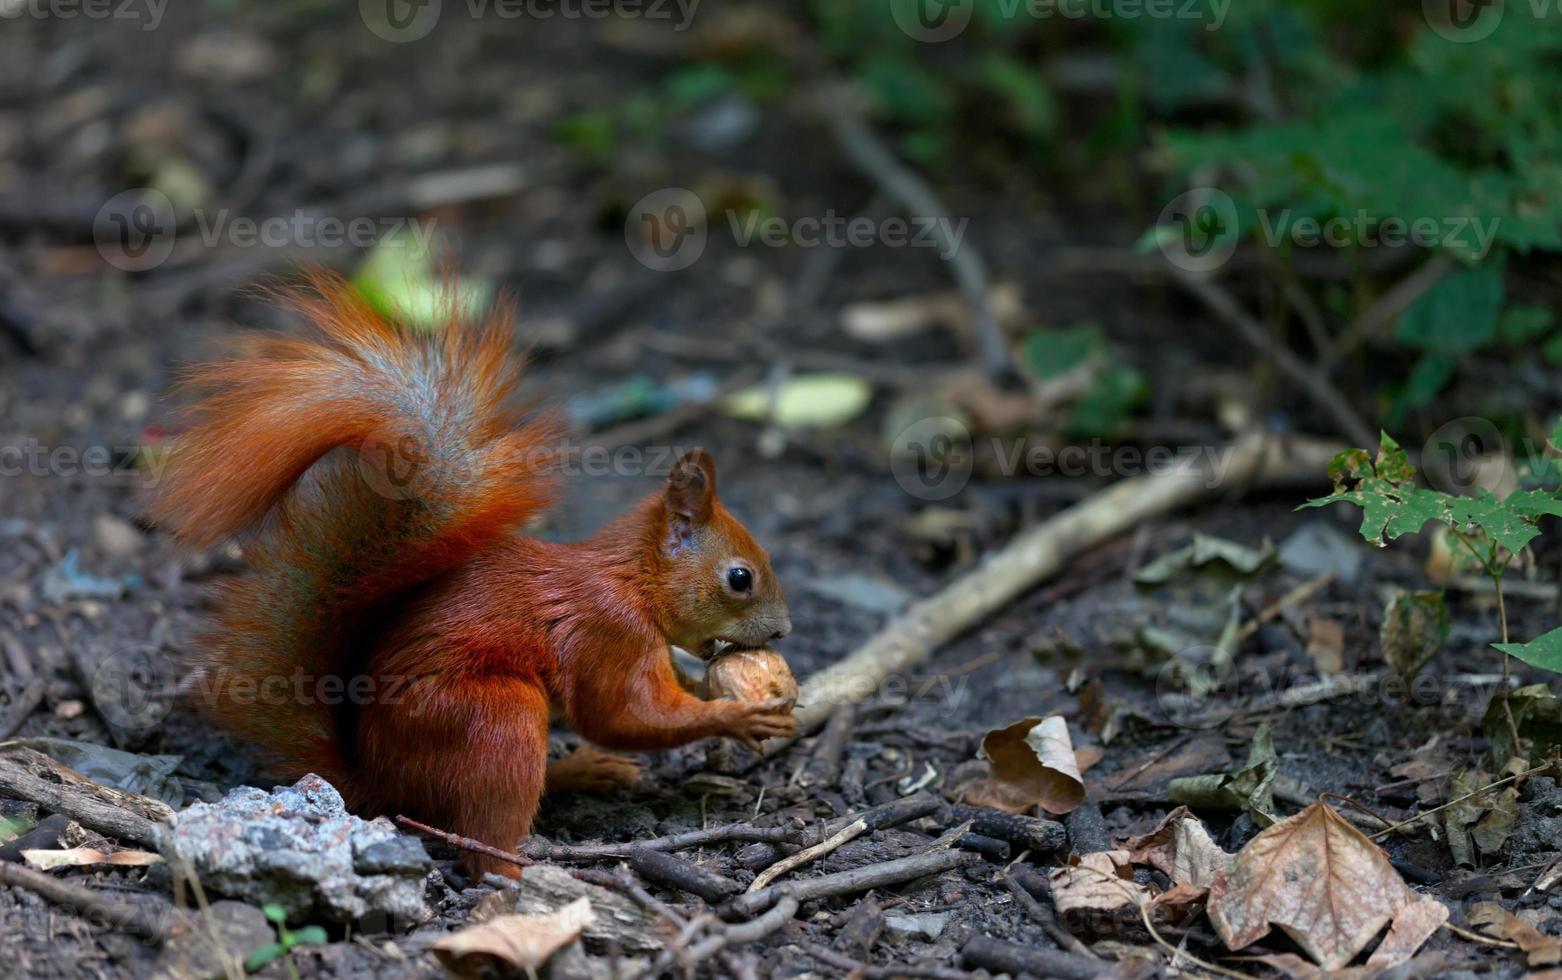 Red squirrel eat walnut in autumn forest photo